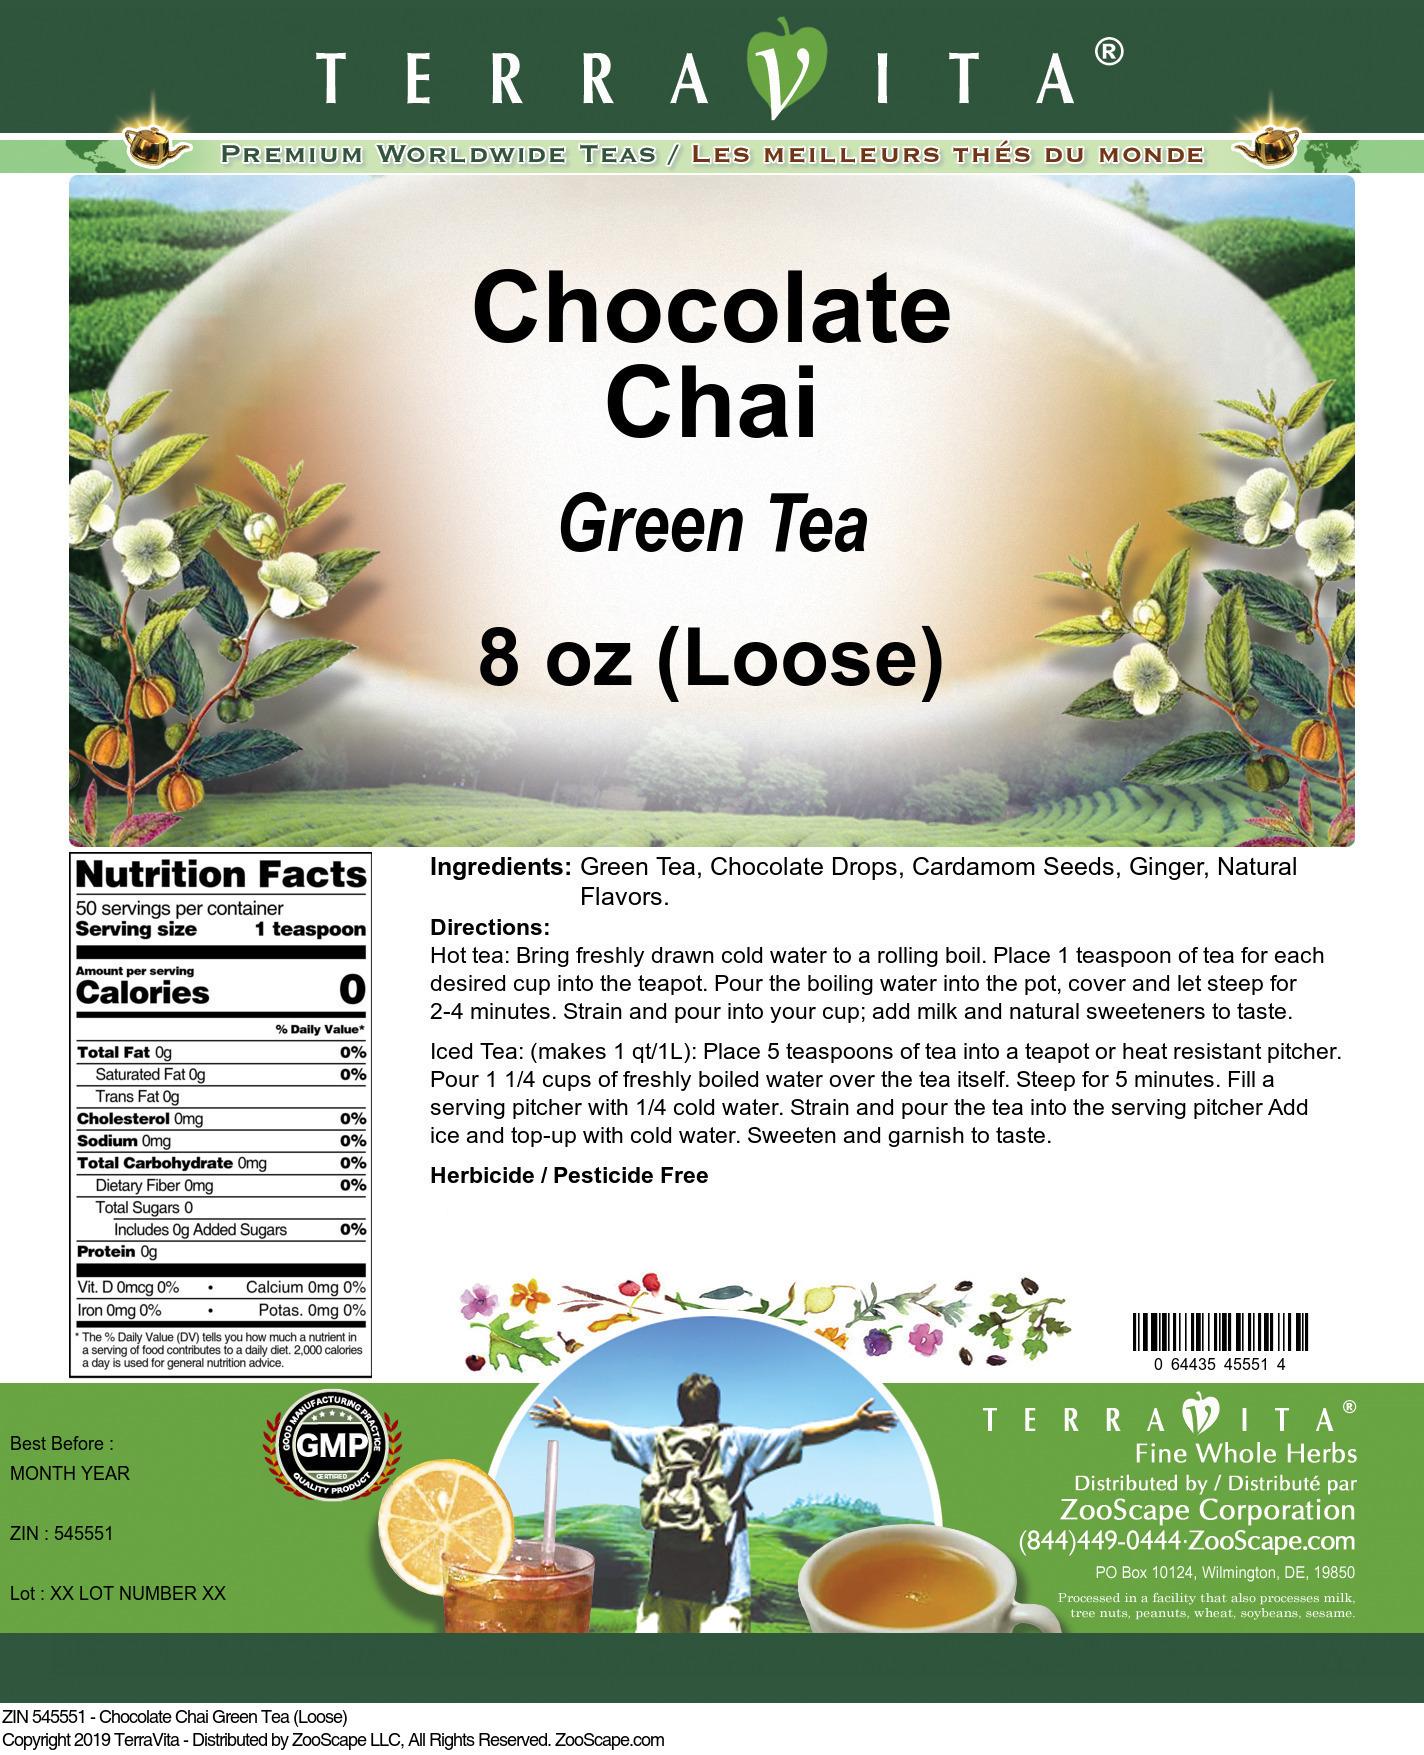 Chocolate Chai Green Tea (Loose)